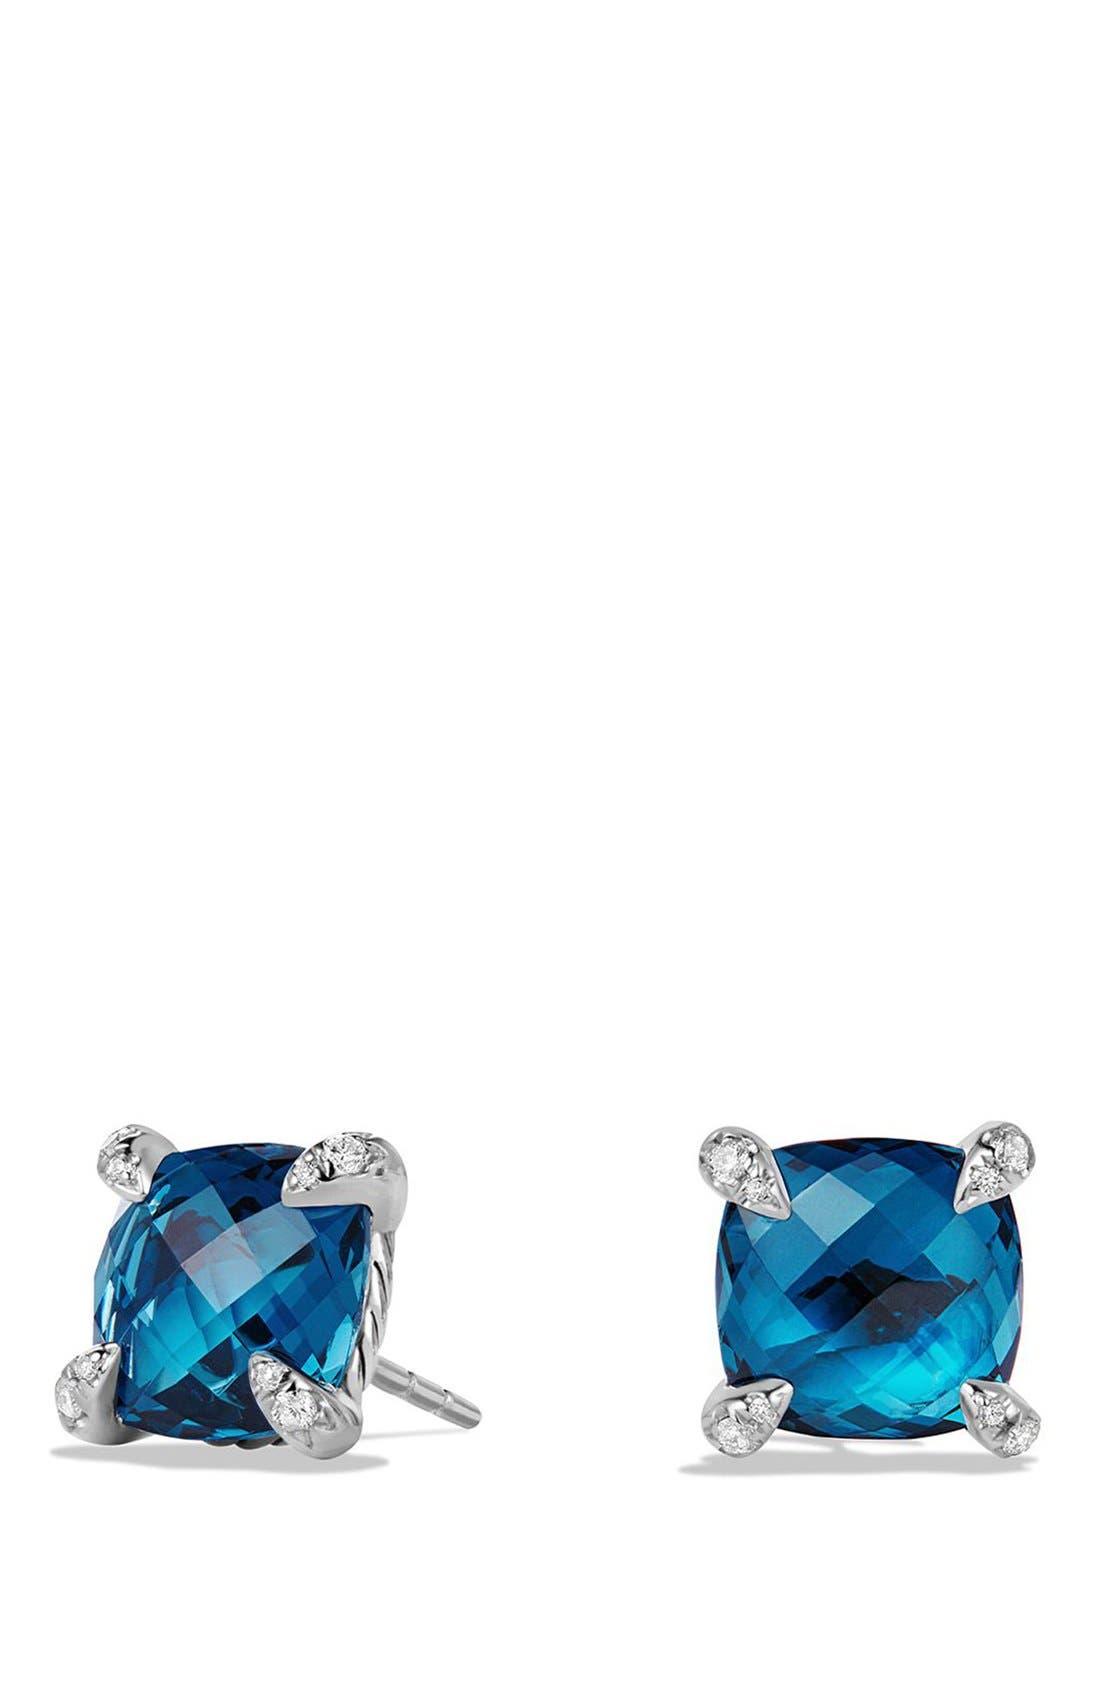 Main Image - David Yurman 'Châtelaine' Earrings with Semiprecious Stones and Diamonds